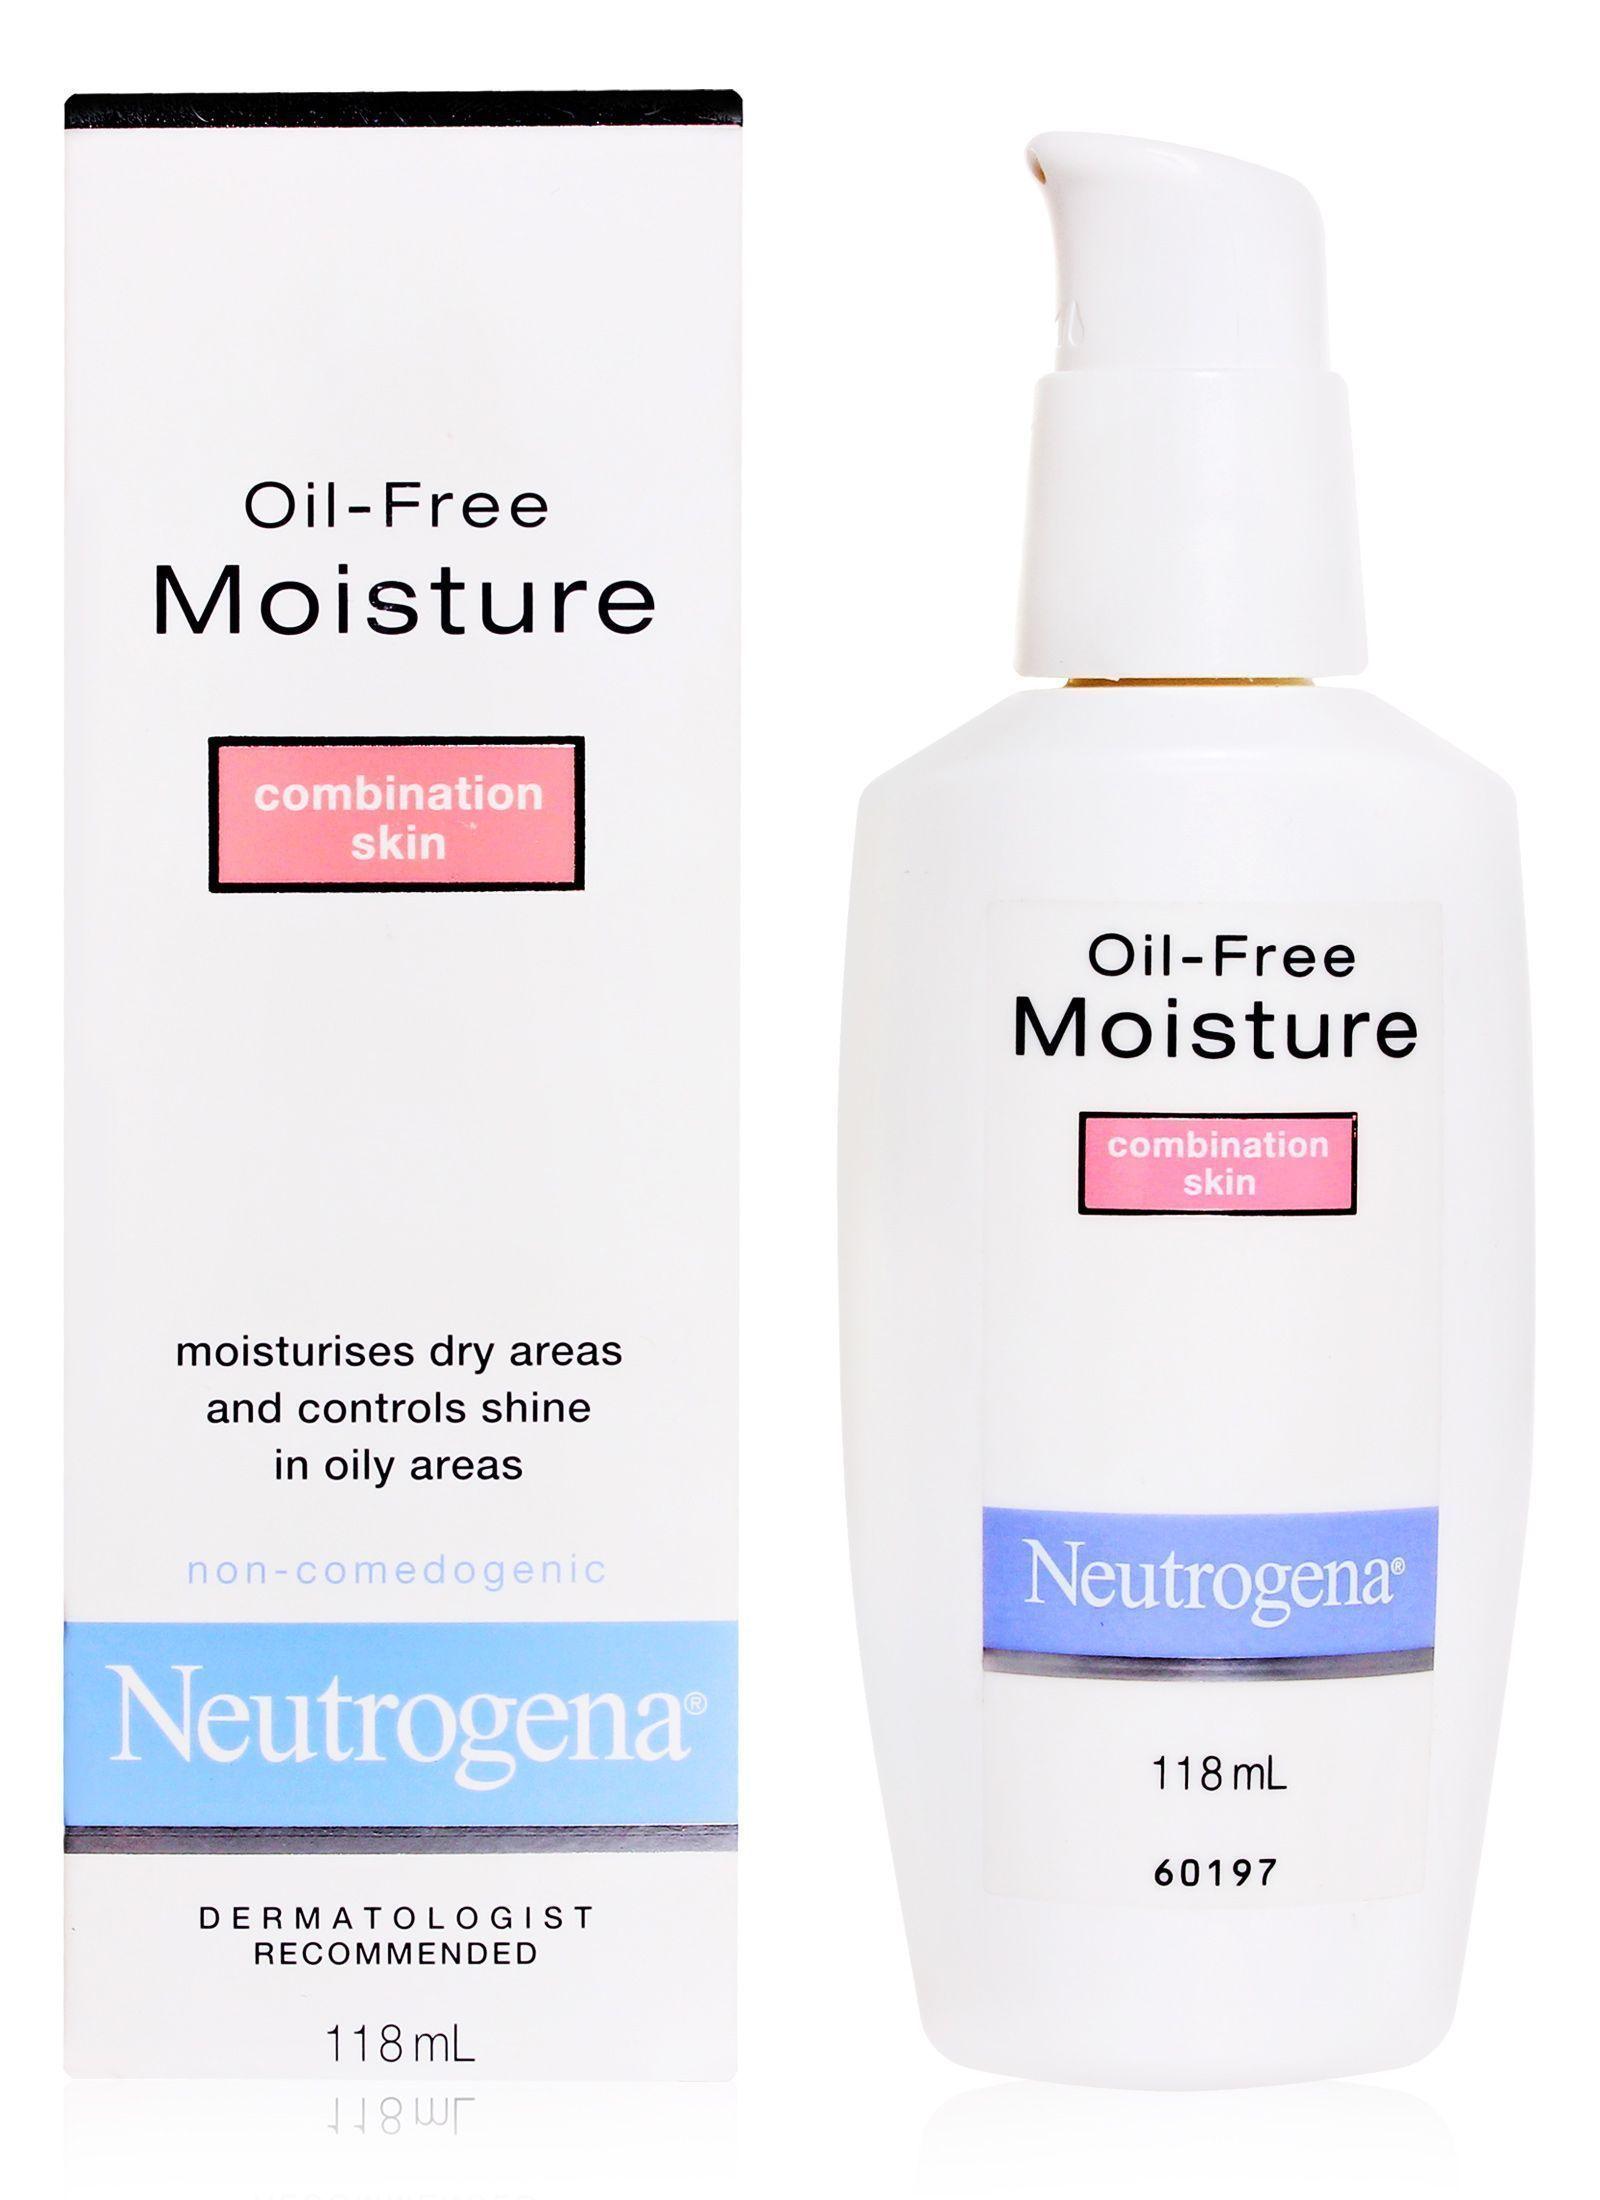 Neutrogena Oil Free Moisturizer Combination Skin My Drugstore Go To Moi Moisturizer For Combination Skin Neutrogena Oil Free Moisturizer Oil Free Moisturizers